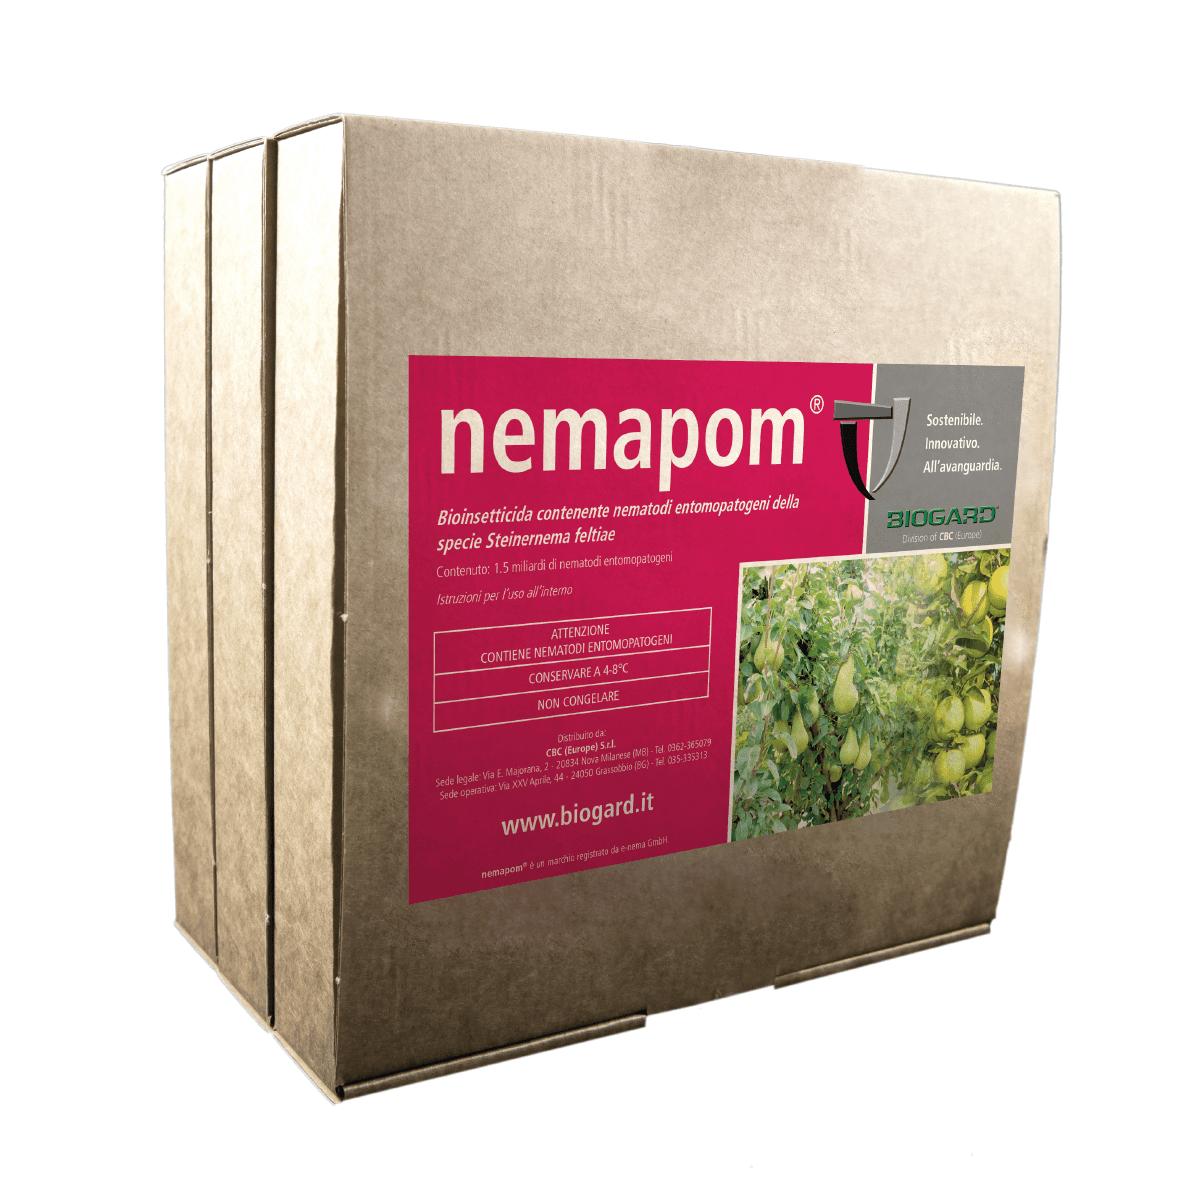 Biogard - Nemapom®